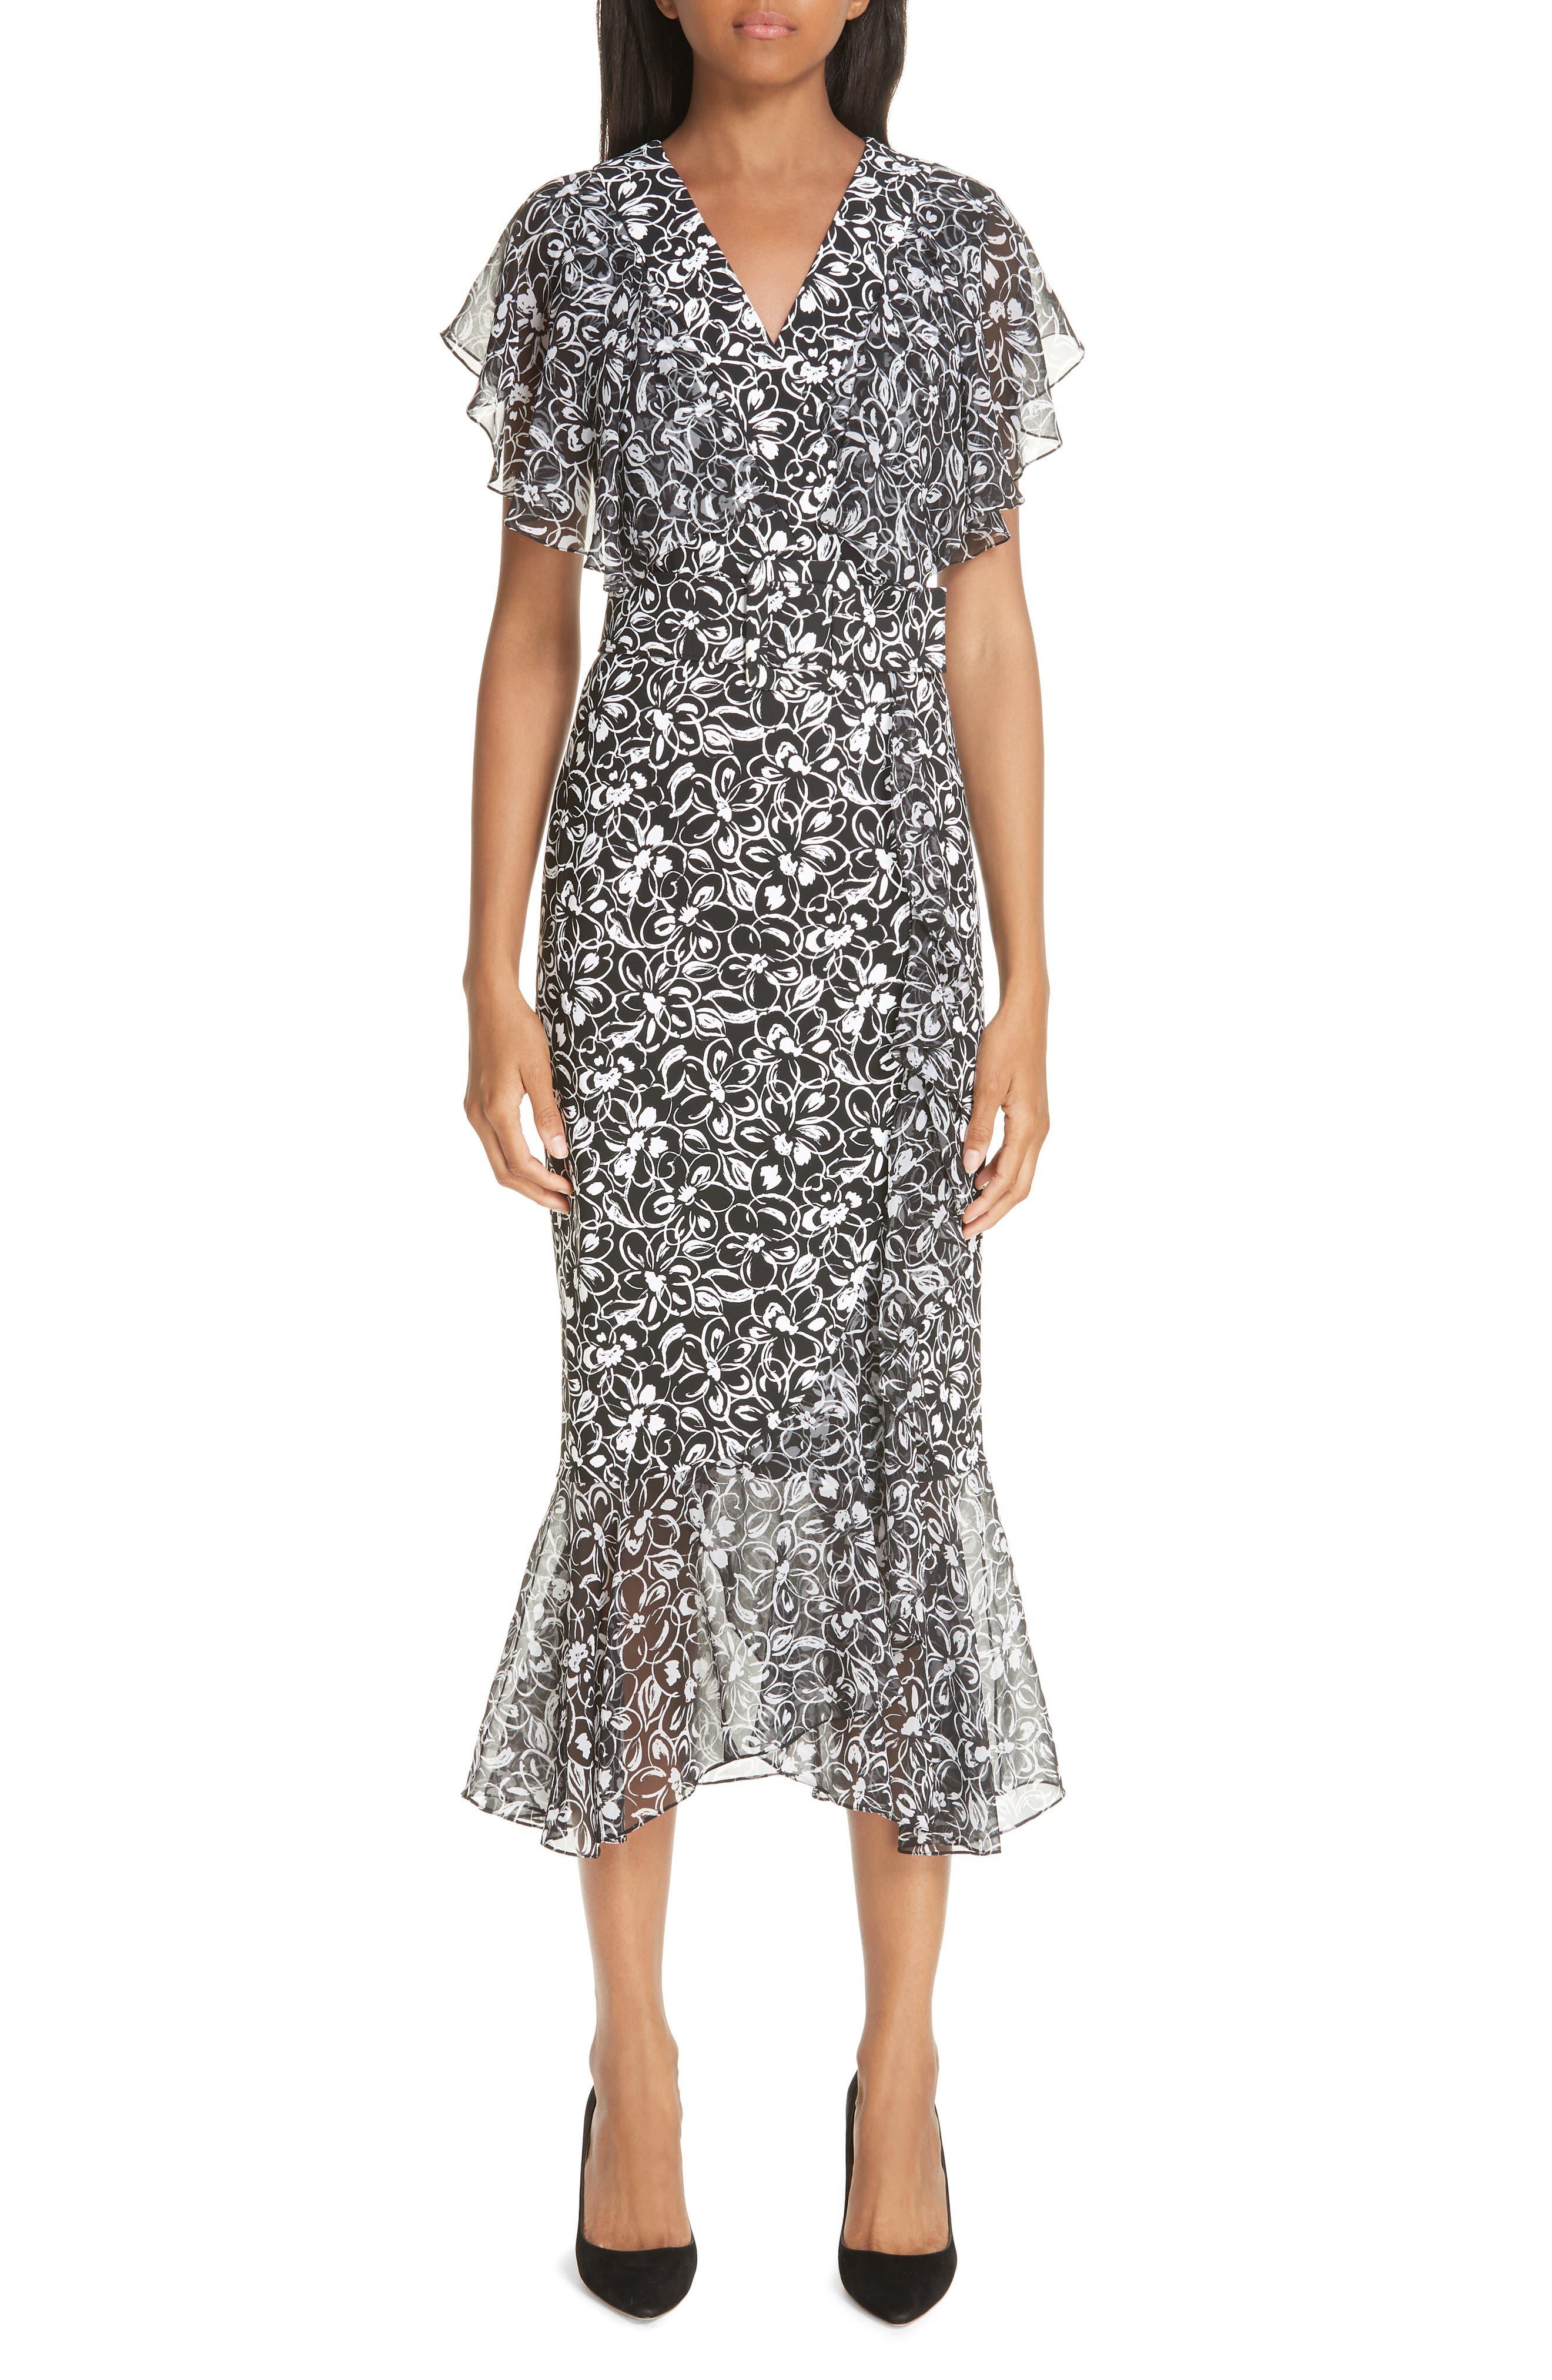 Michael Kors Painterly Floral Belted Ruffle Trim Dress, Black